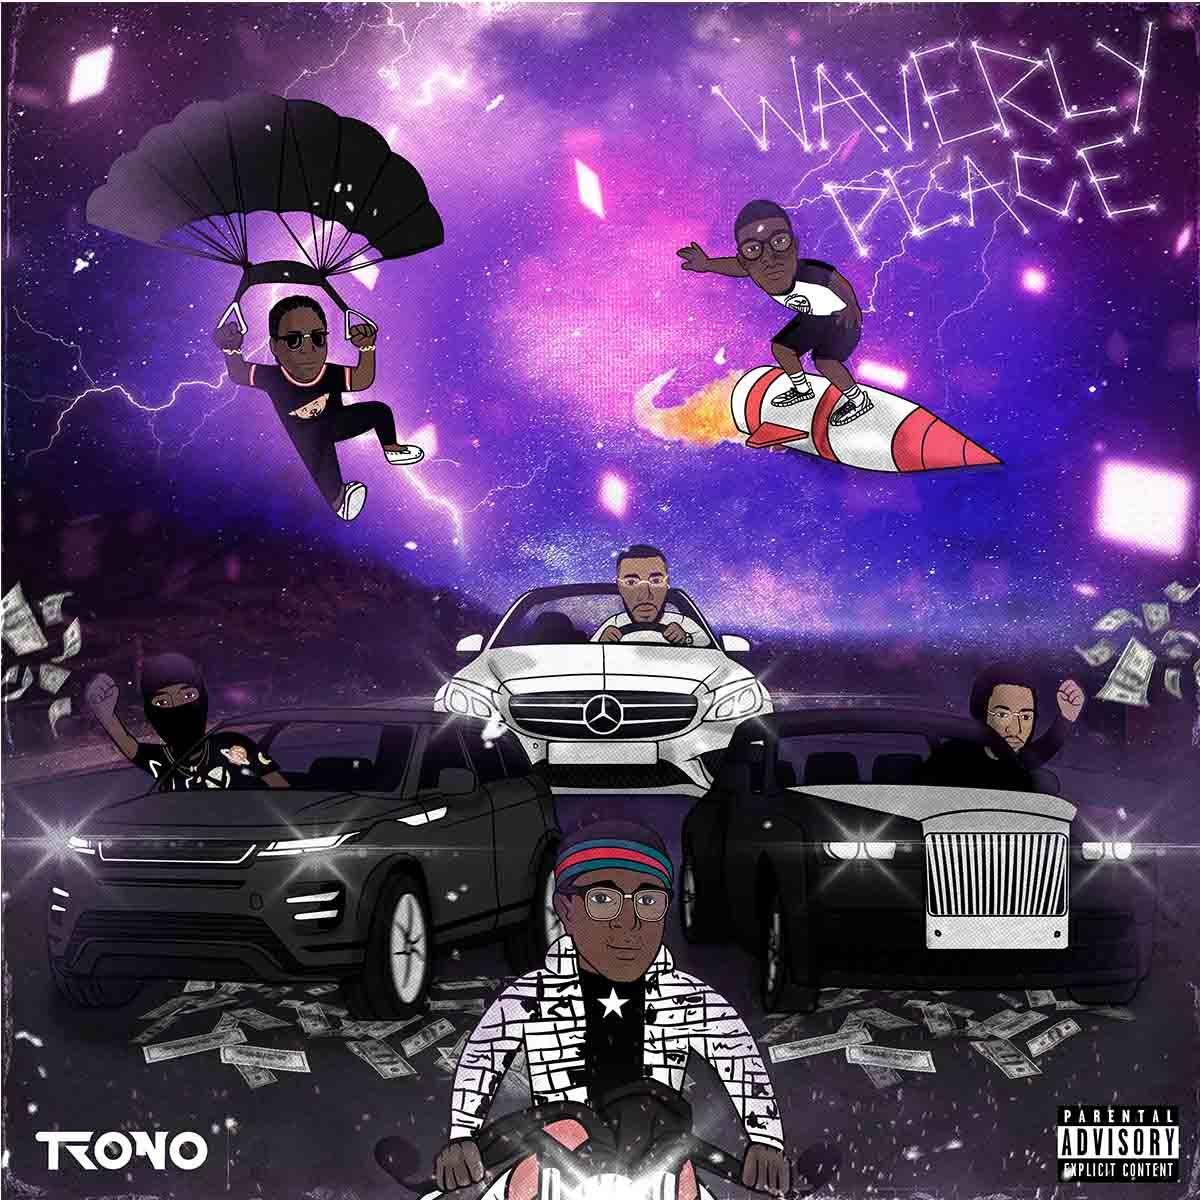 Trono (Micha Star, Bbrocket, MimoFukk) - Funaná (feat. Kelson Most Wanted)